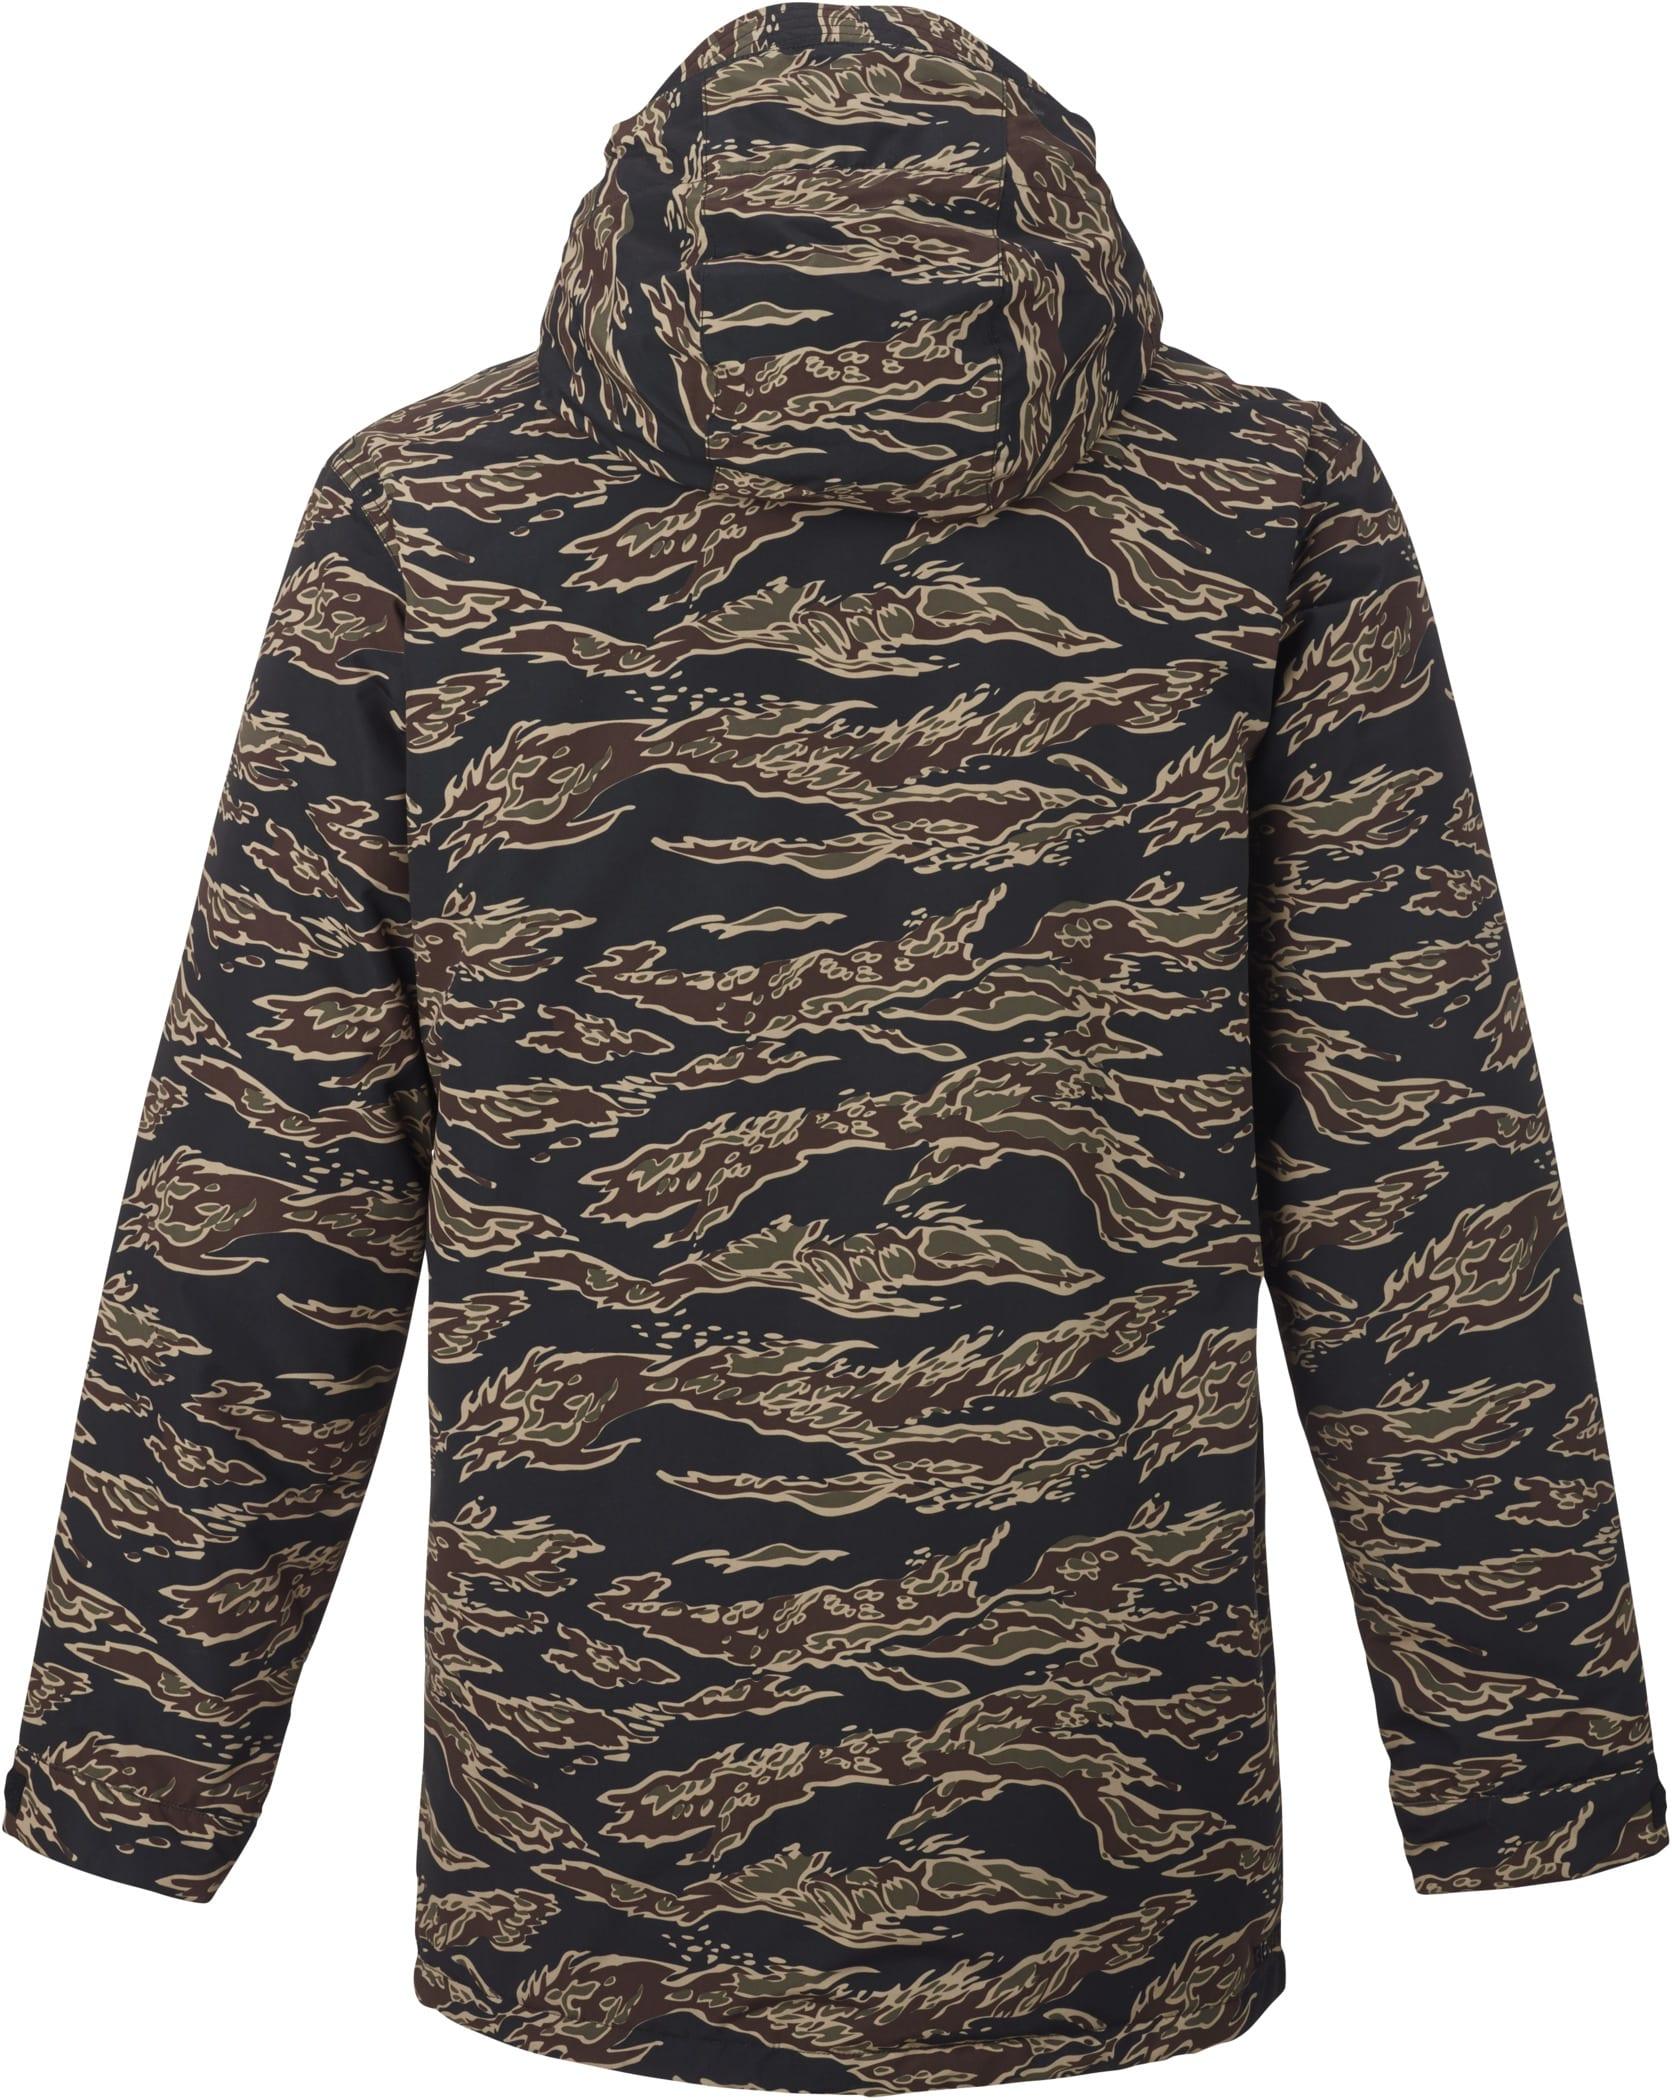 On sale burton twc headliner snowboard jacket up to 40 off for Housse snowboard burton